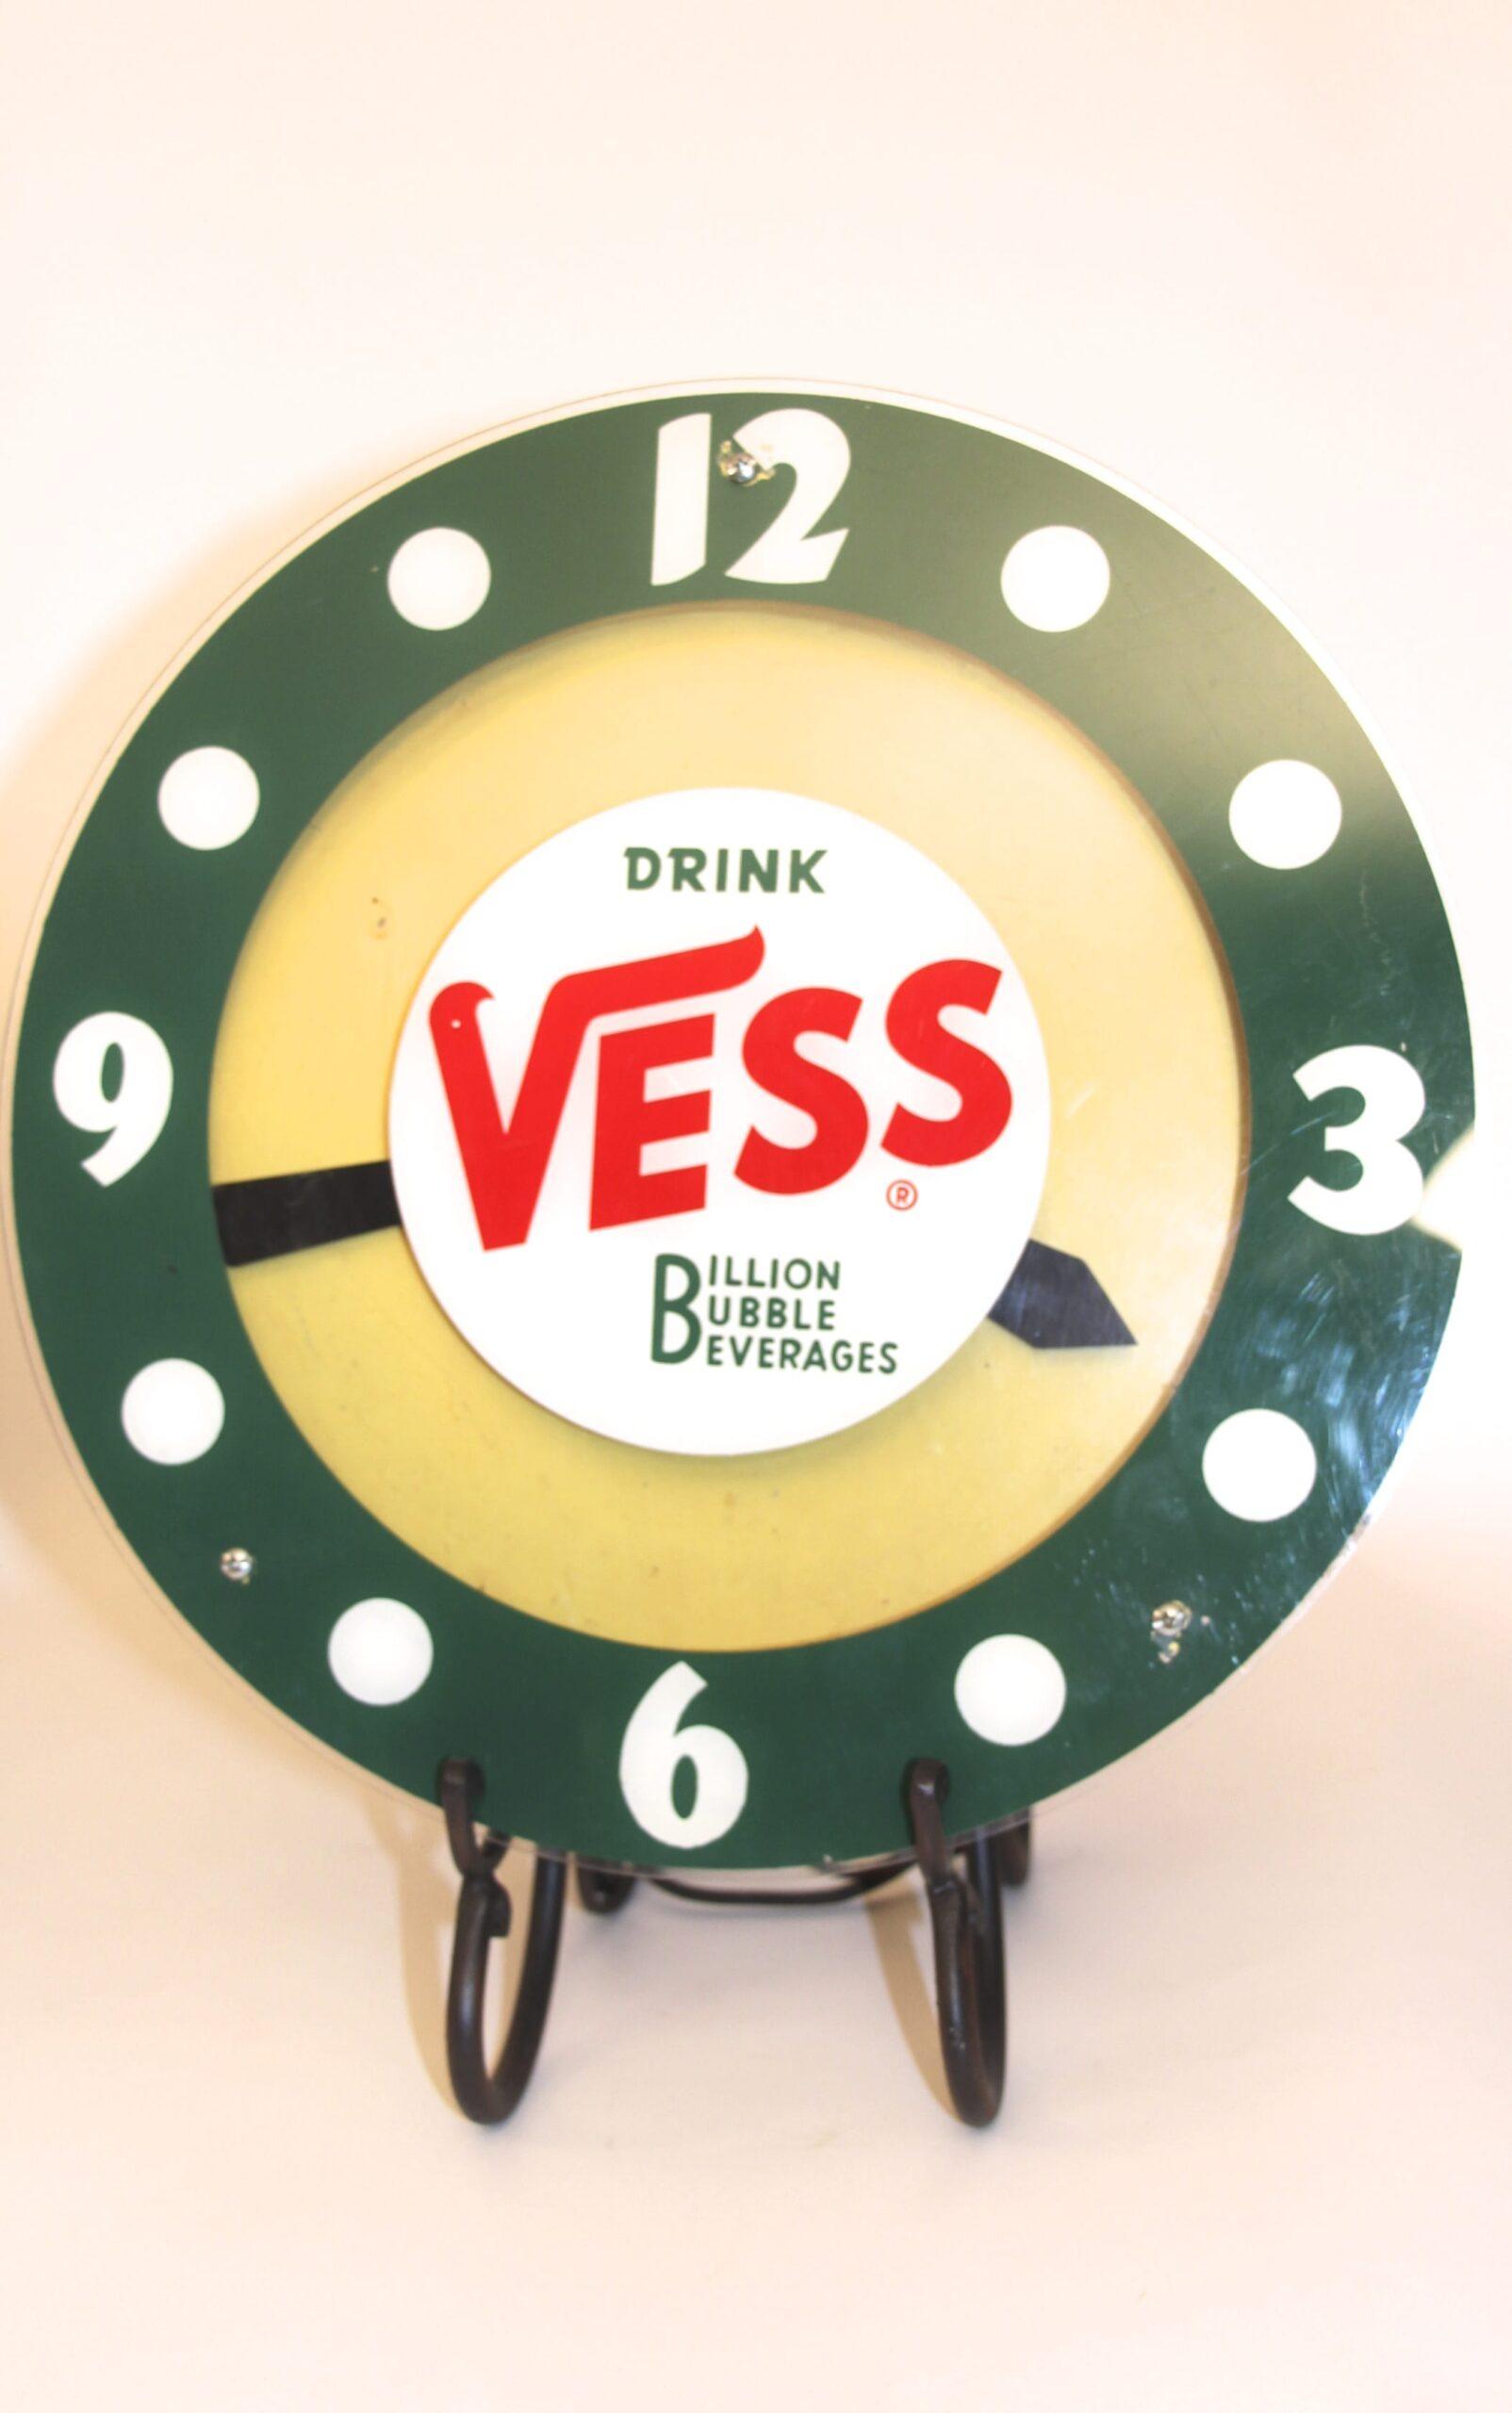 Vess Soda Clock 1950